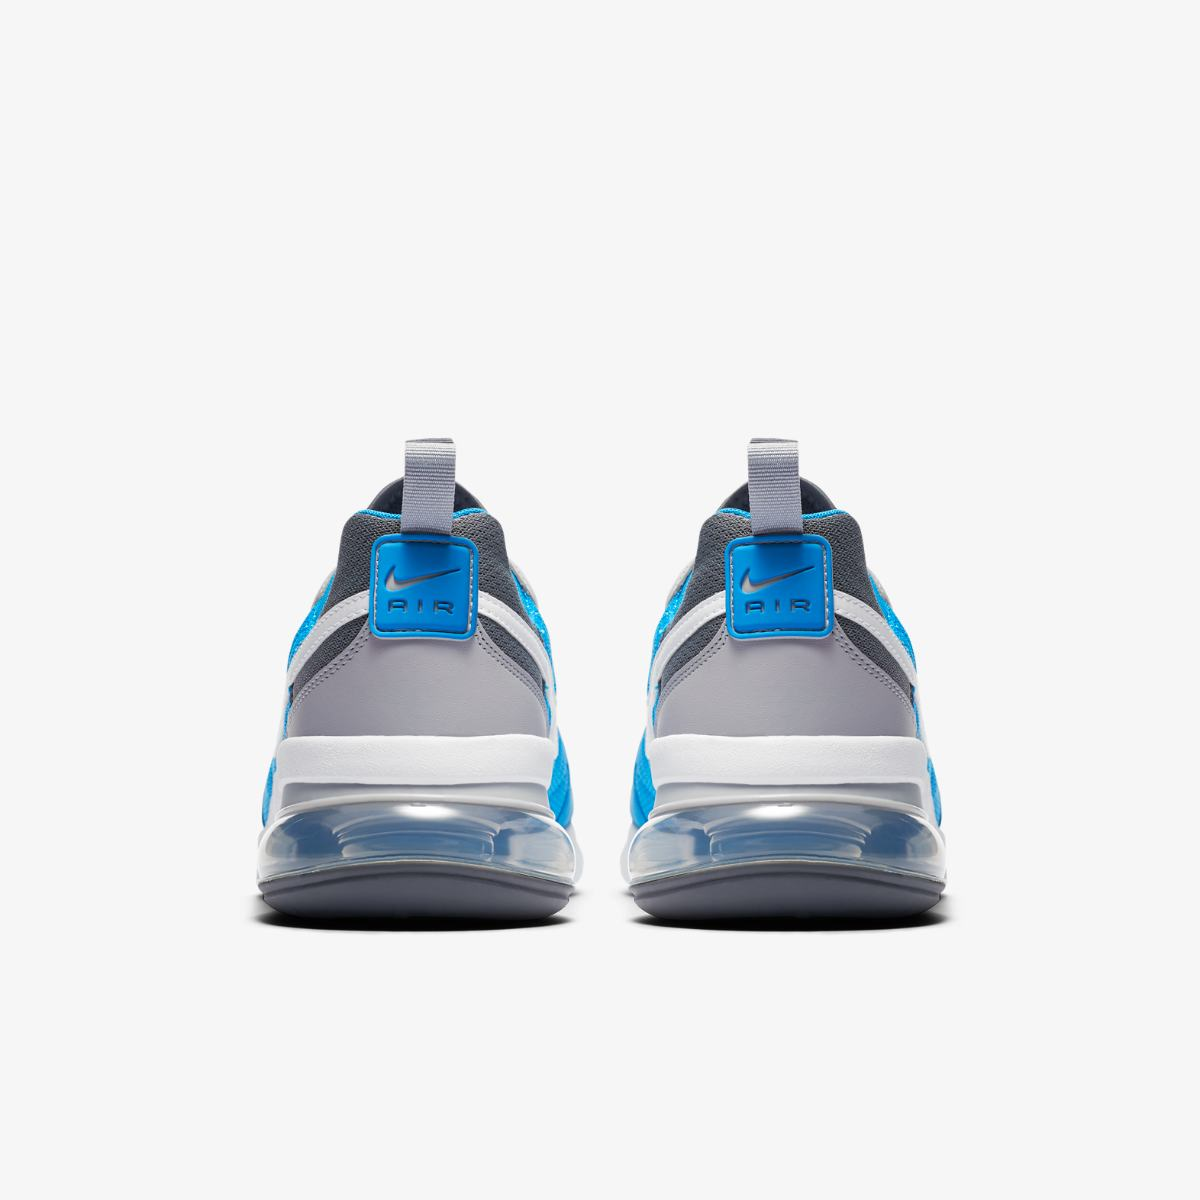 cb34d20c Кроссовки Nike AIR MAX 270 FUTURA AO1569-003 купить | allstars.ua